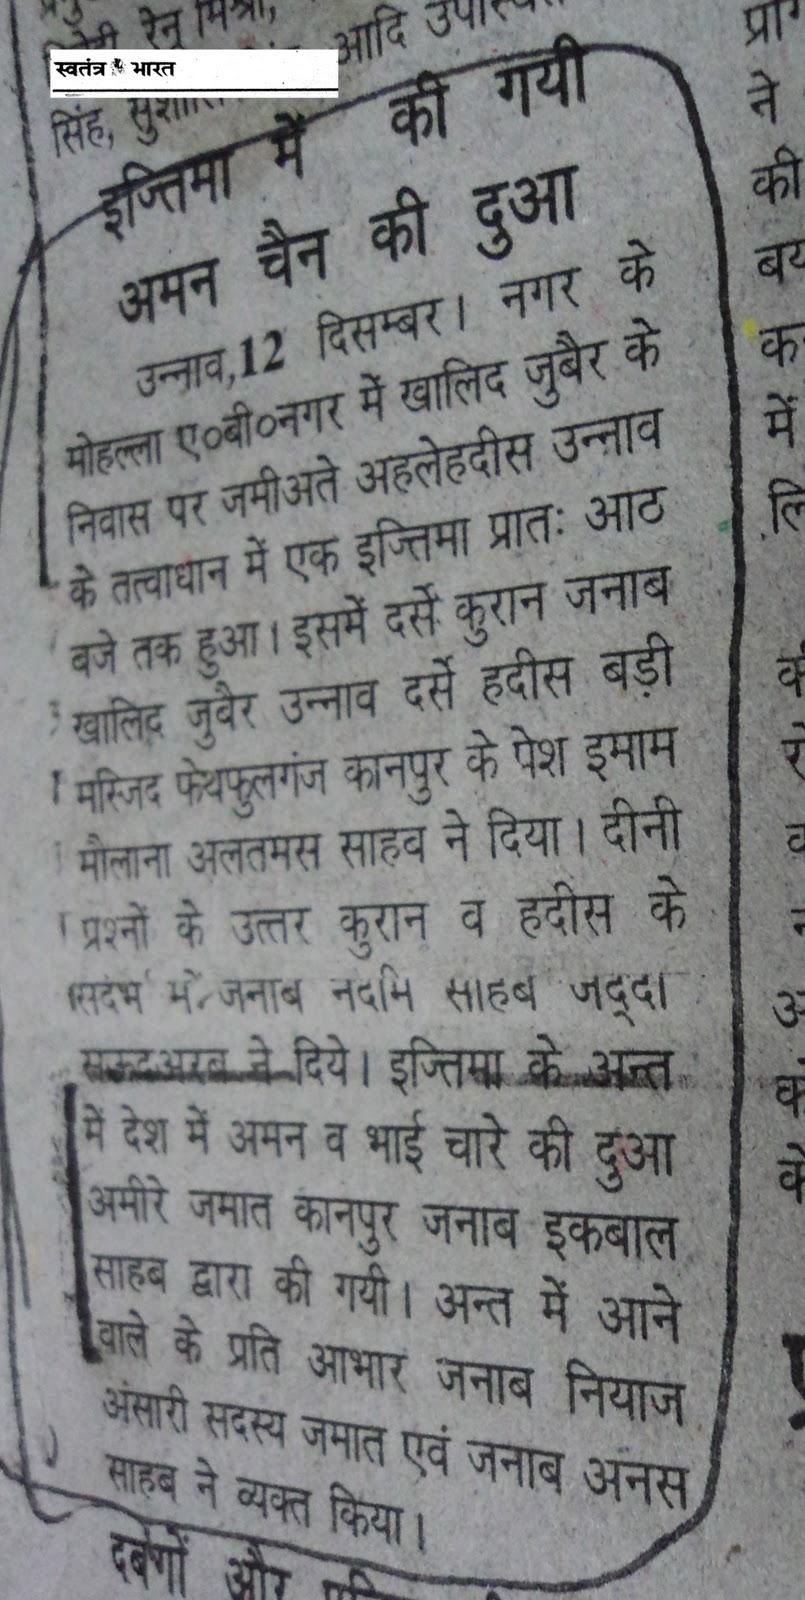 essay on bharat swatantra sangram in hindi download Swatantra vidyalaya harish patel felt he will make his directorial debut with a hindi- marathi bi speech essay sample ::swatantra bharat:: downloadhindi essay.